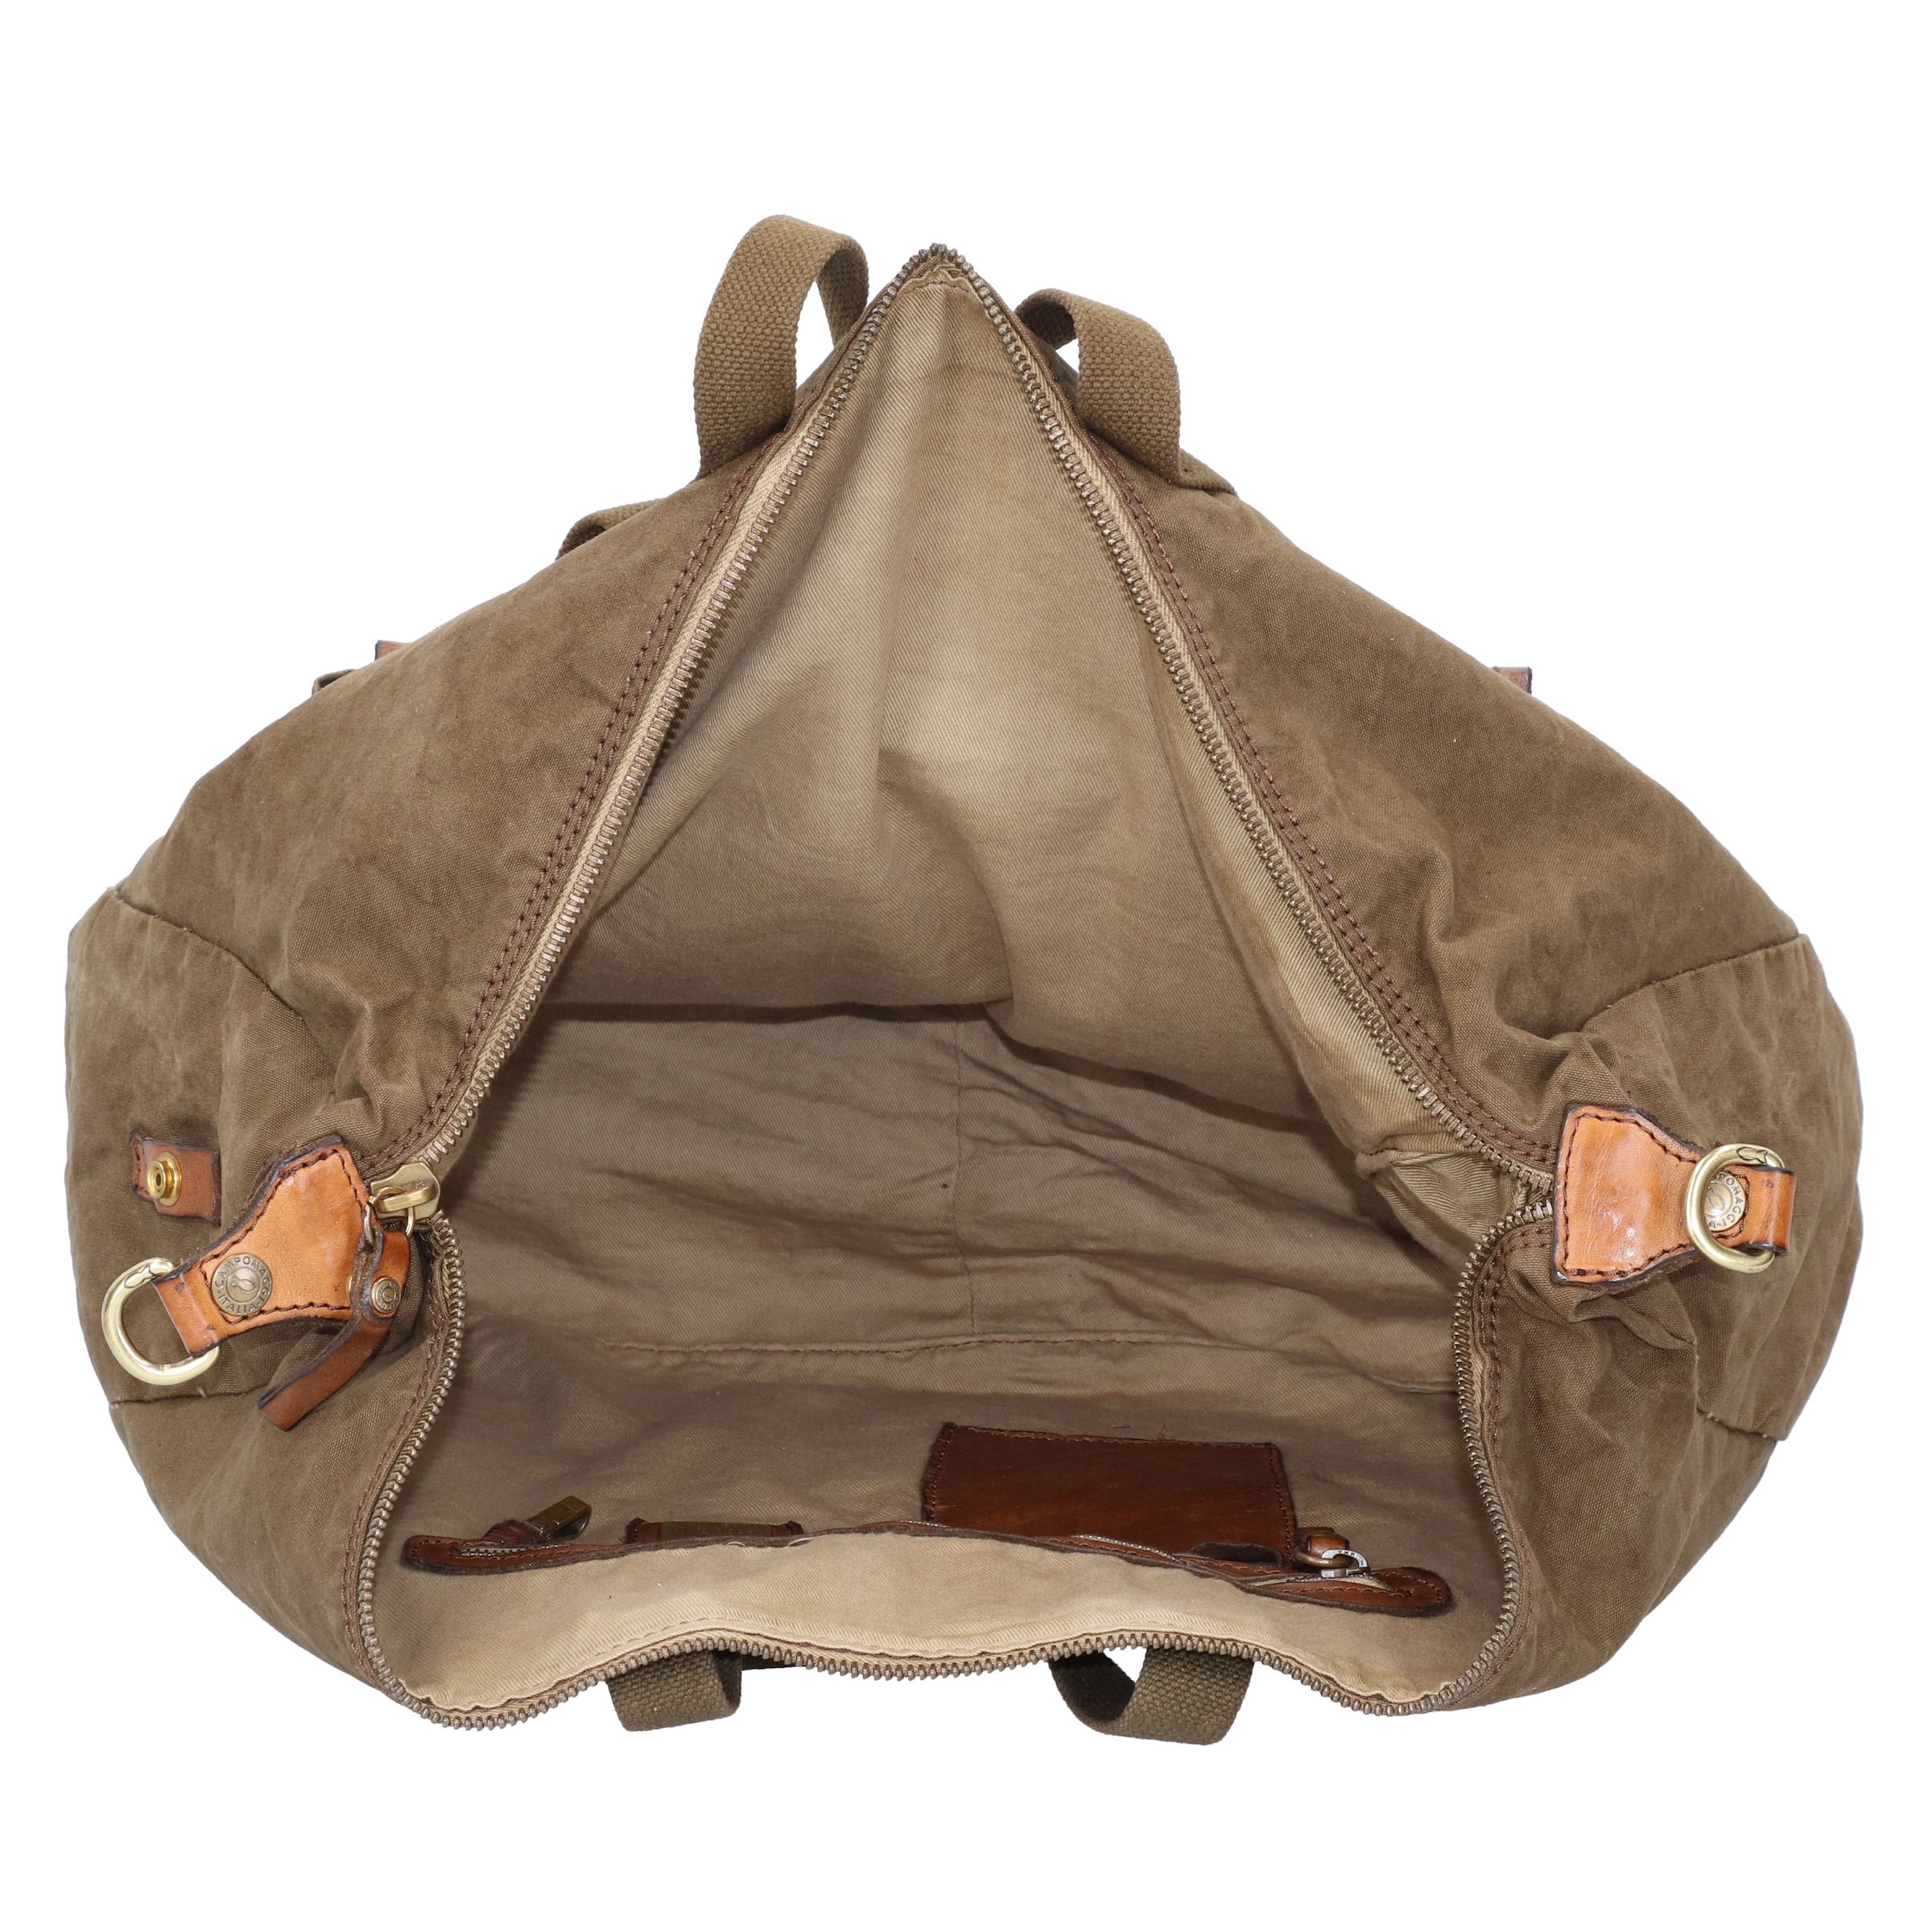 Campomaggi BraunBrokat In In BraunBrokat Campomaggi Handtasche Campomaggi Handtasche BraunBrokat Handtasche In Handtasche Campomaggi In D9IWH2eEY